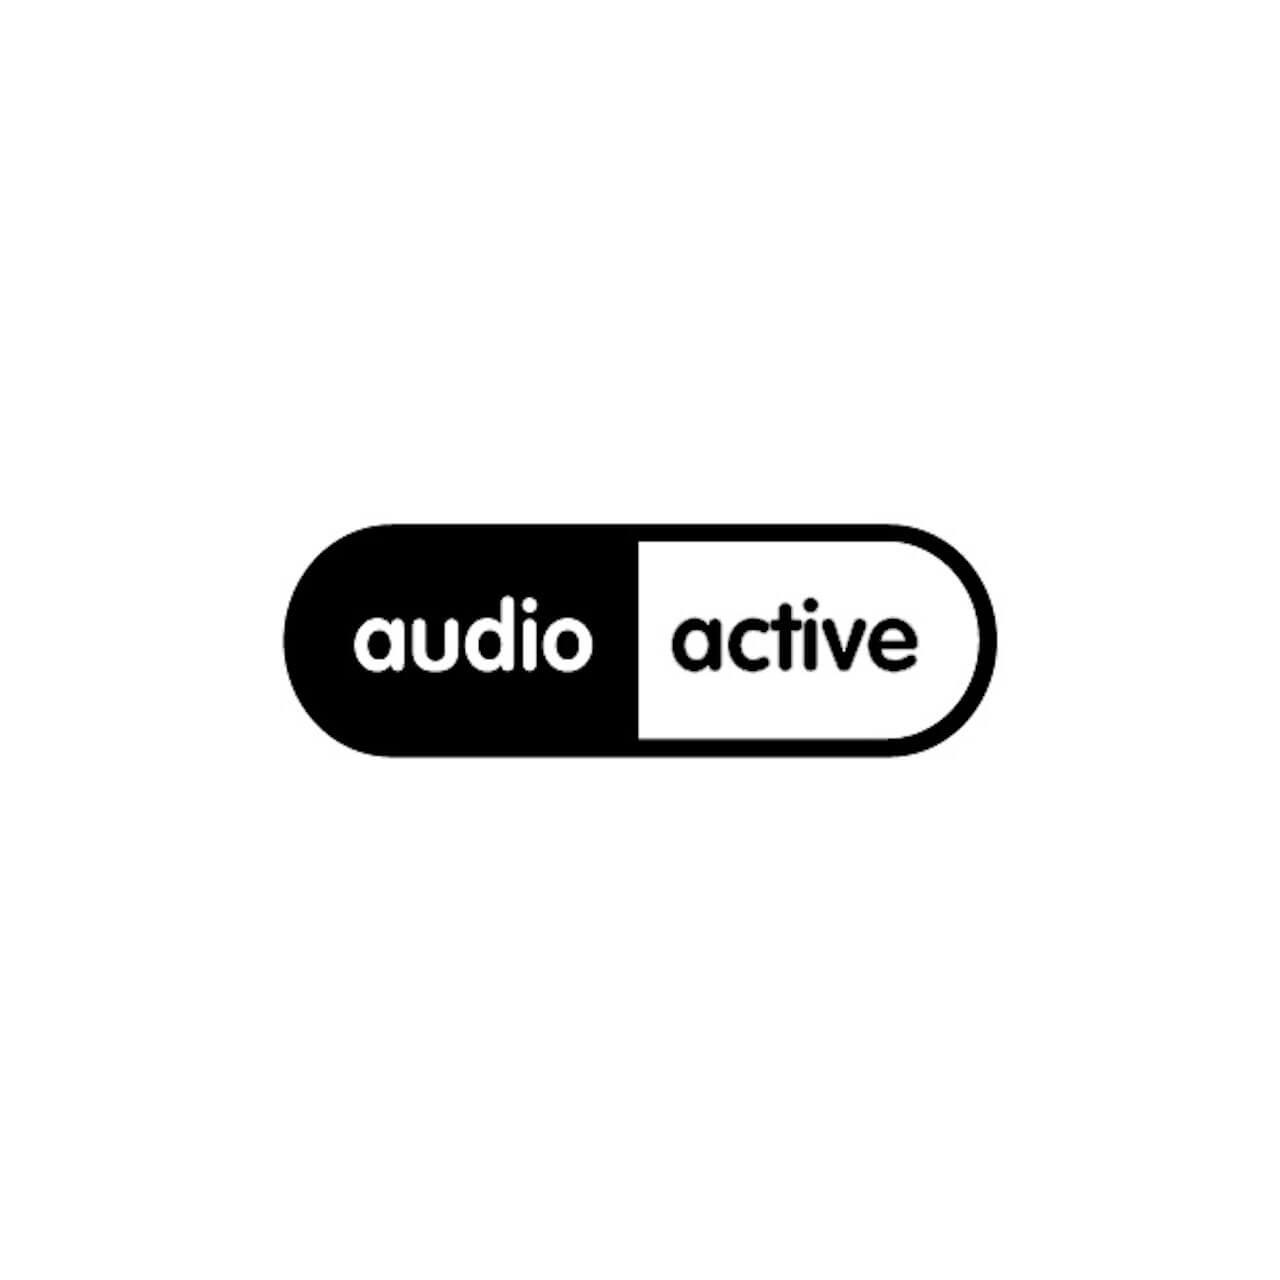 LIQUIDROOMのコラボT企画〈We will meet again〉最新リリース!宇宙を彷徨い吸業中のaudio activeから、緊吸メッセージT到着 music200612-liquidroom-audioactive